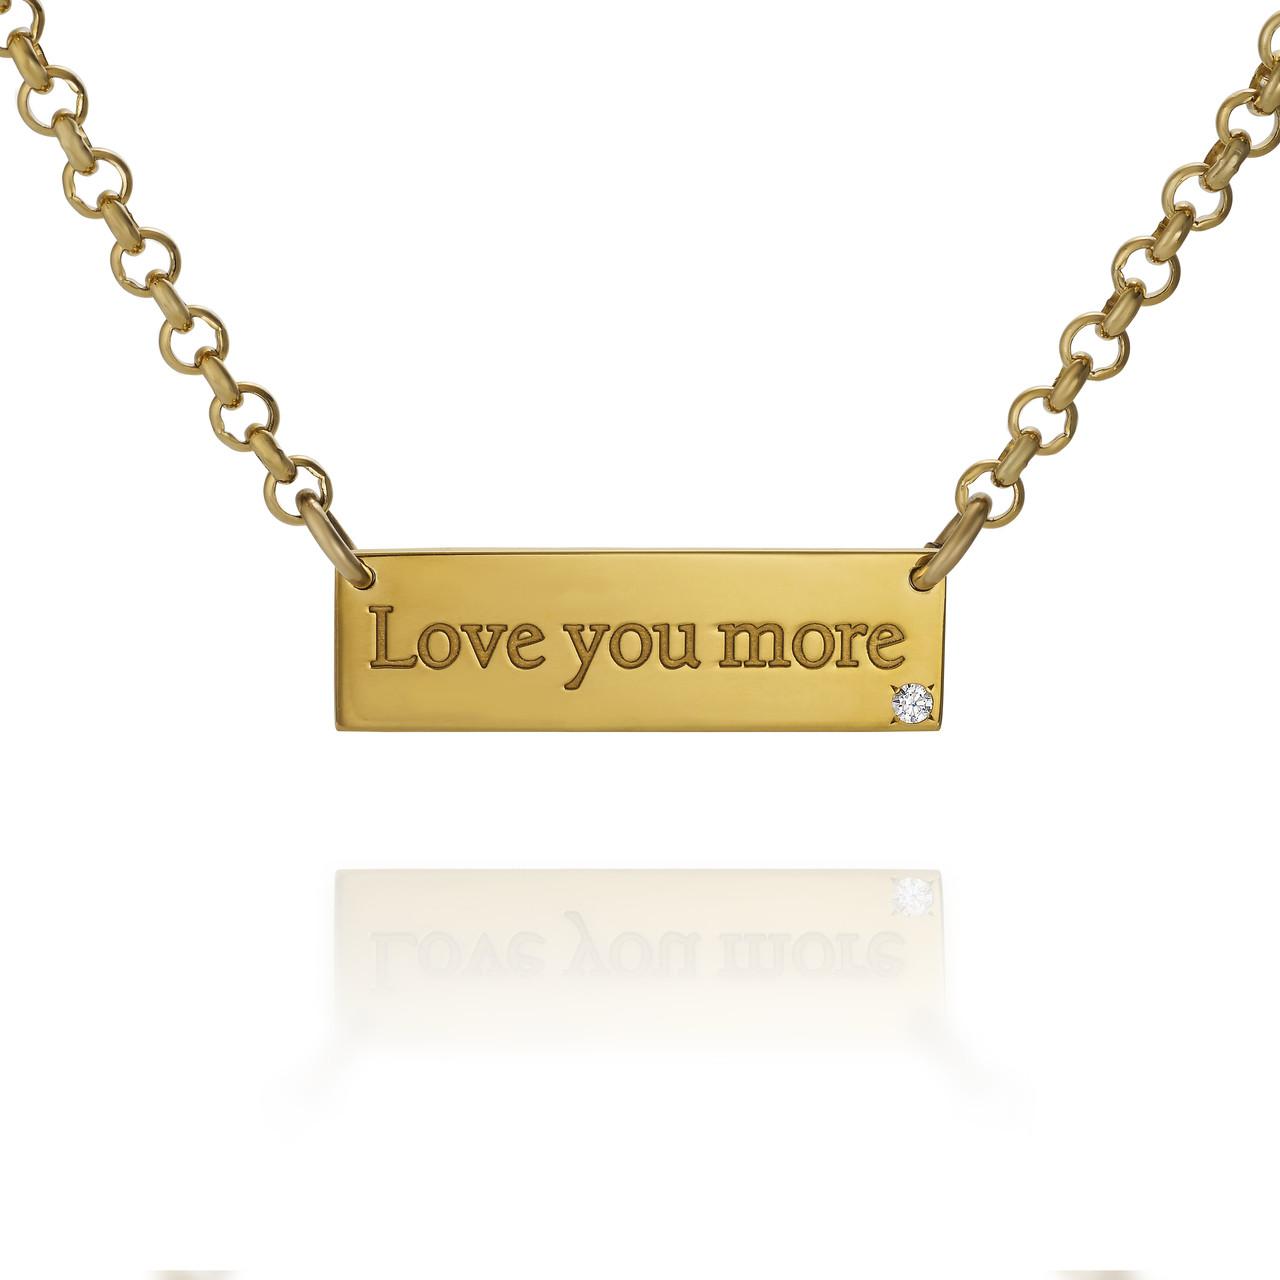 Colby Davis of Boston Jewelry/Necklaces